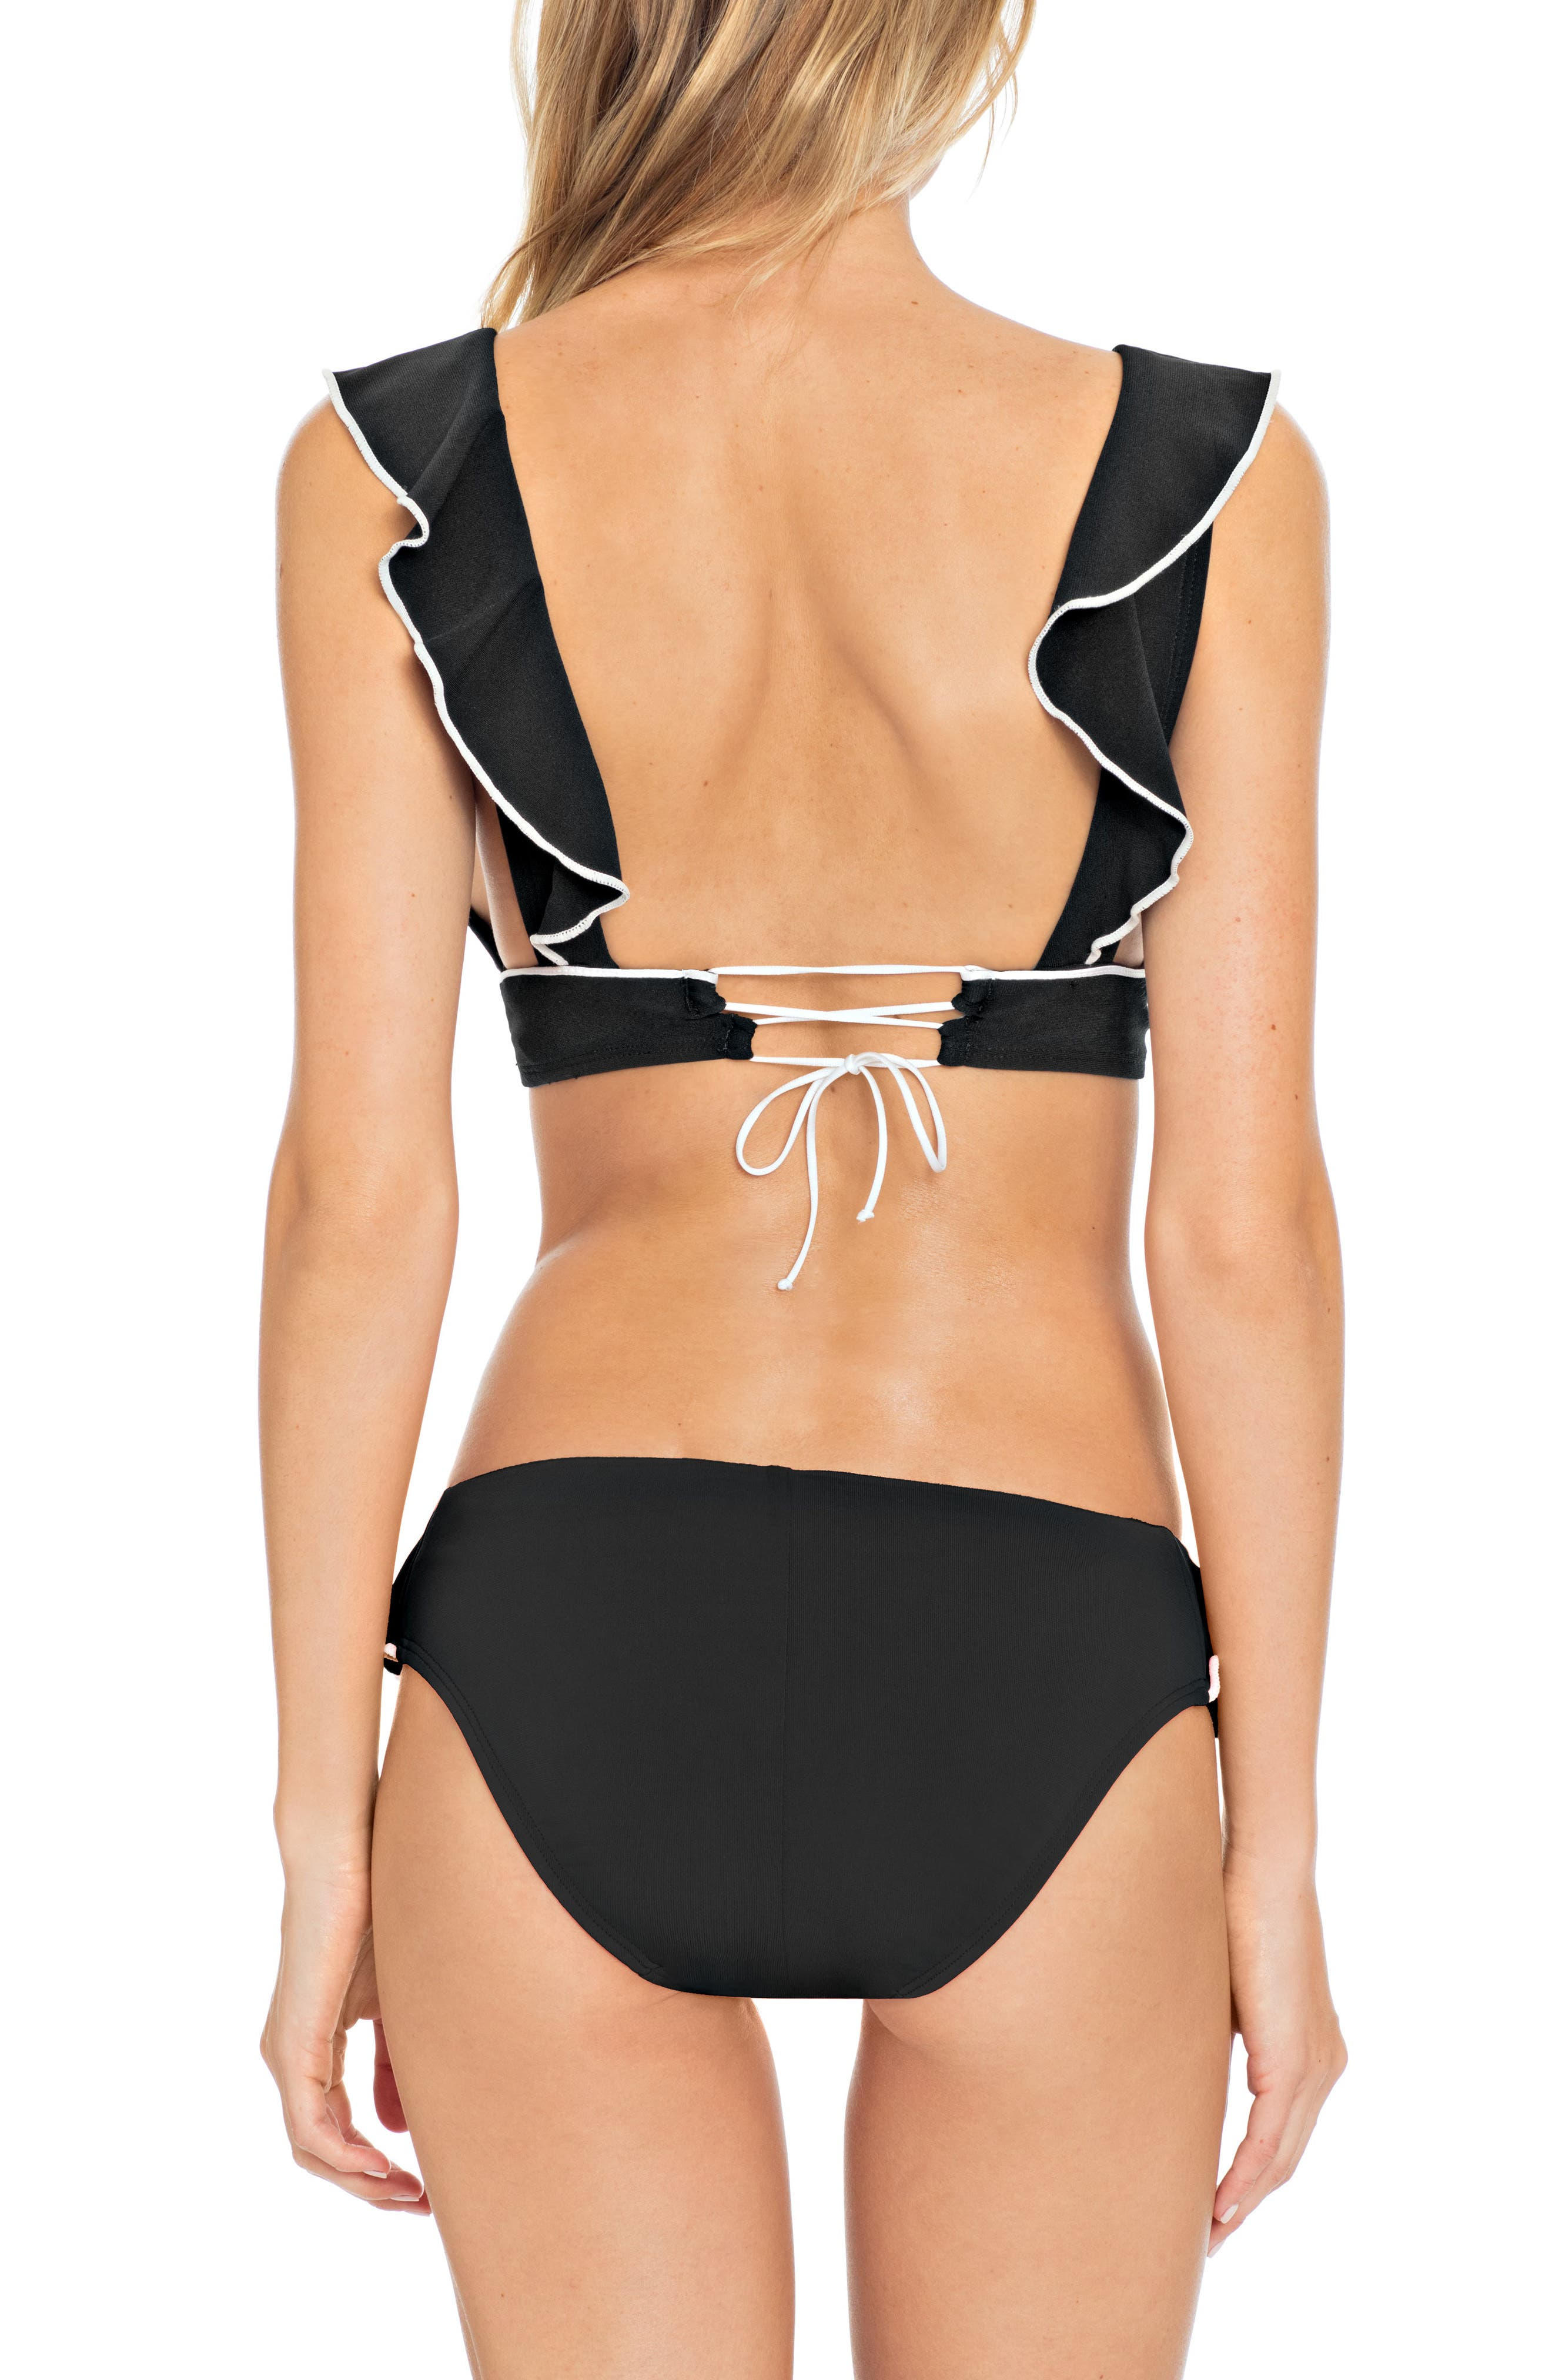 Malia Ruffle Bikini Top,                             Alternate thumbnail 4, color,                             BLACK/ IVORY